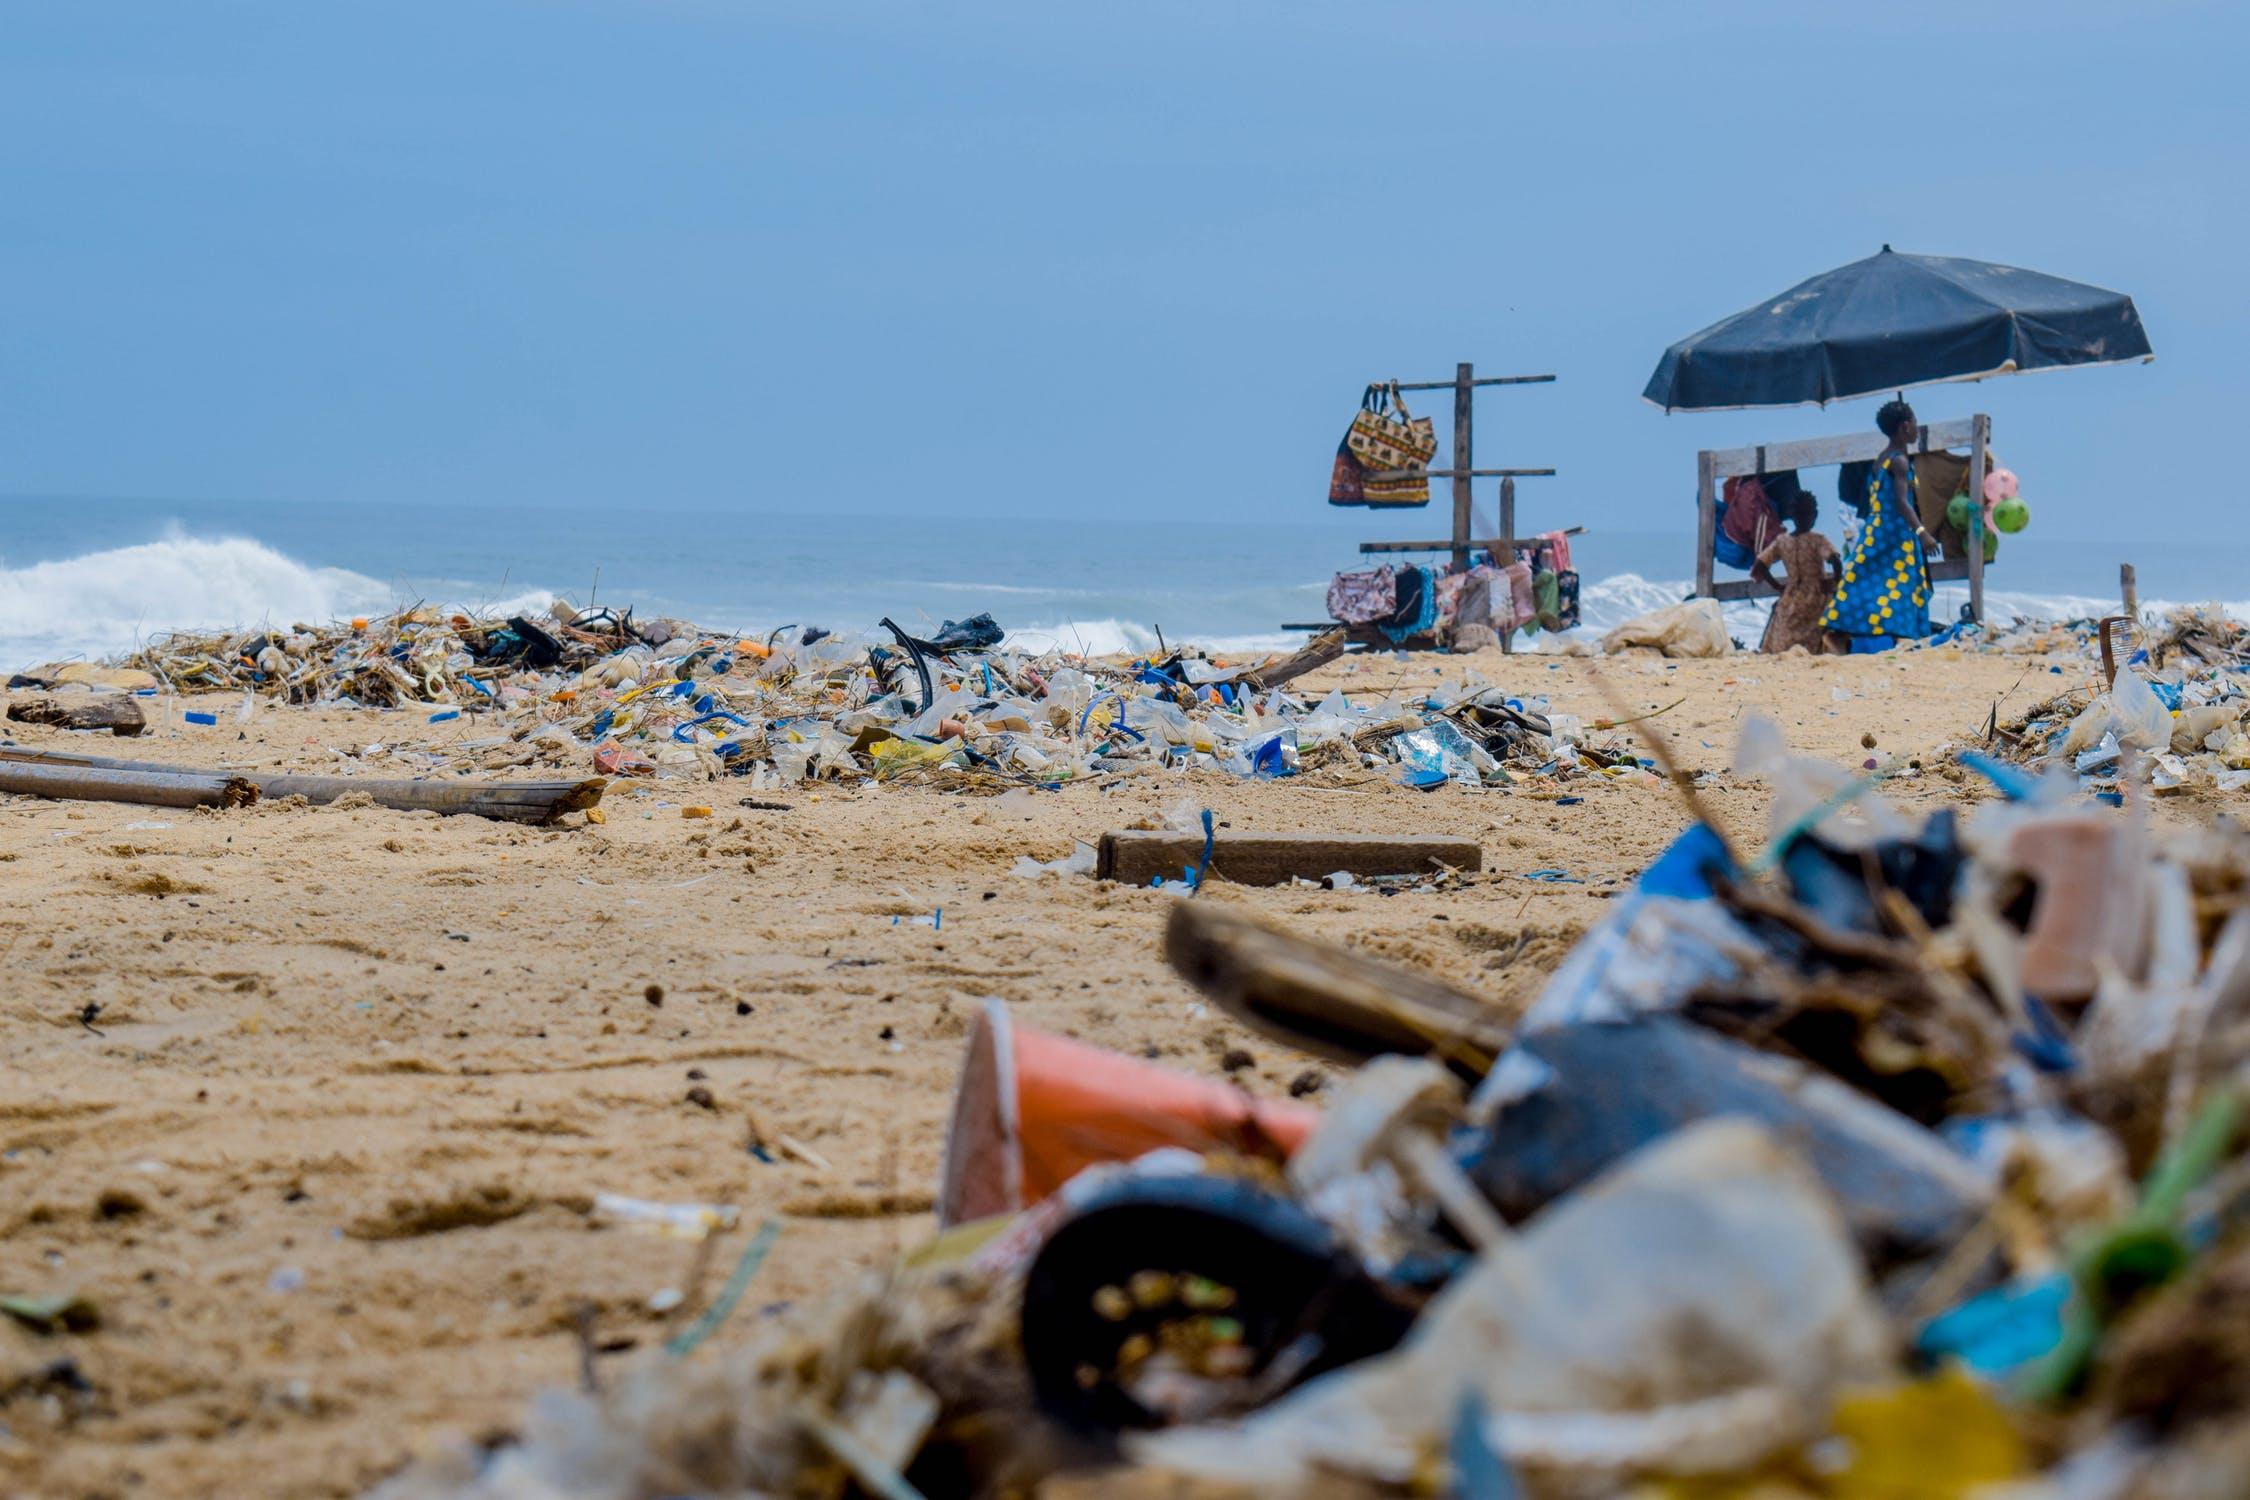 Plastic waste strewn about a beach